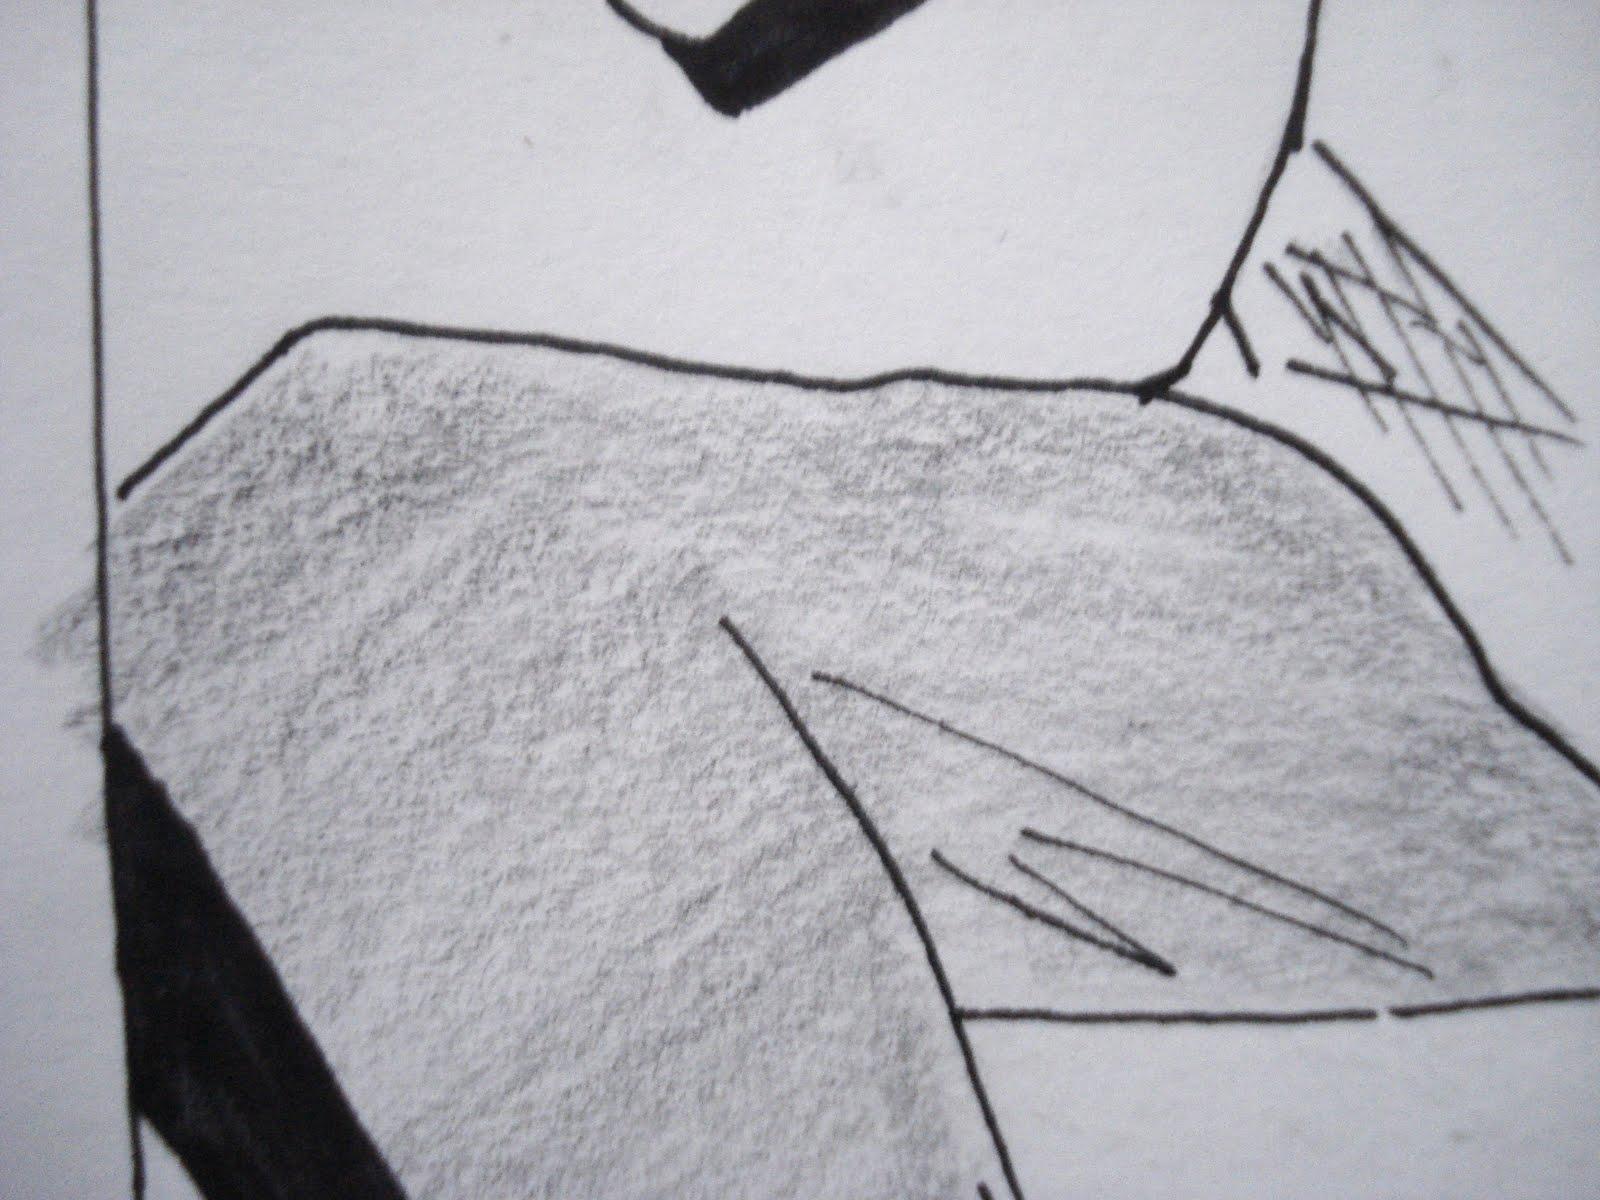 Novios Abrazados Dibujo 28370